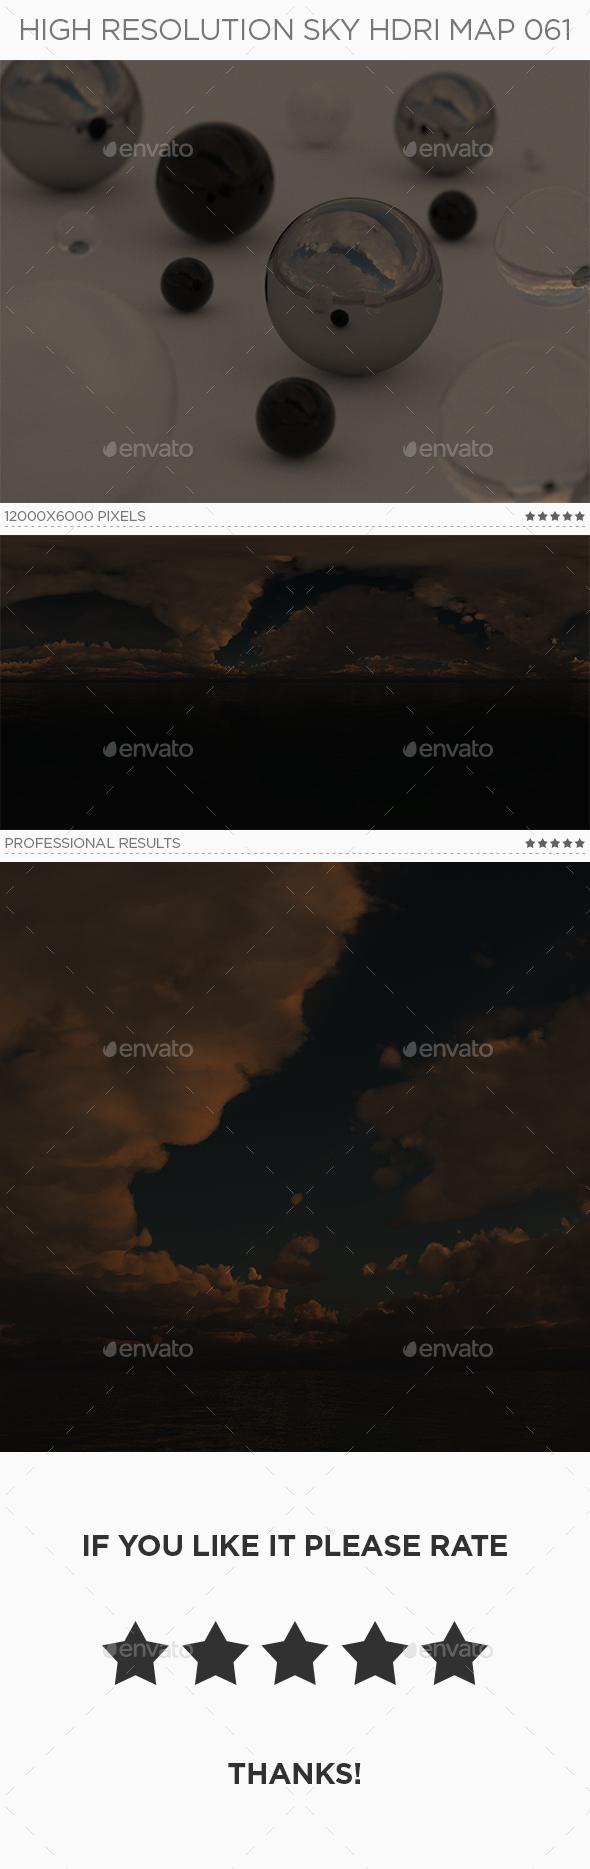 High Resolution Sky HDRi Map 061